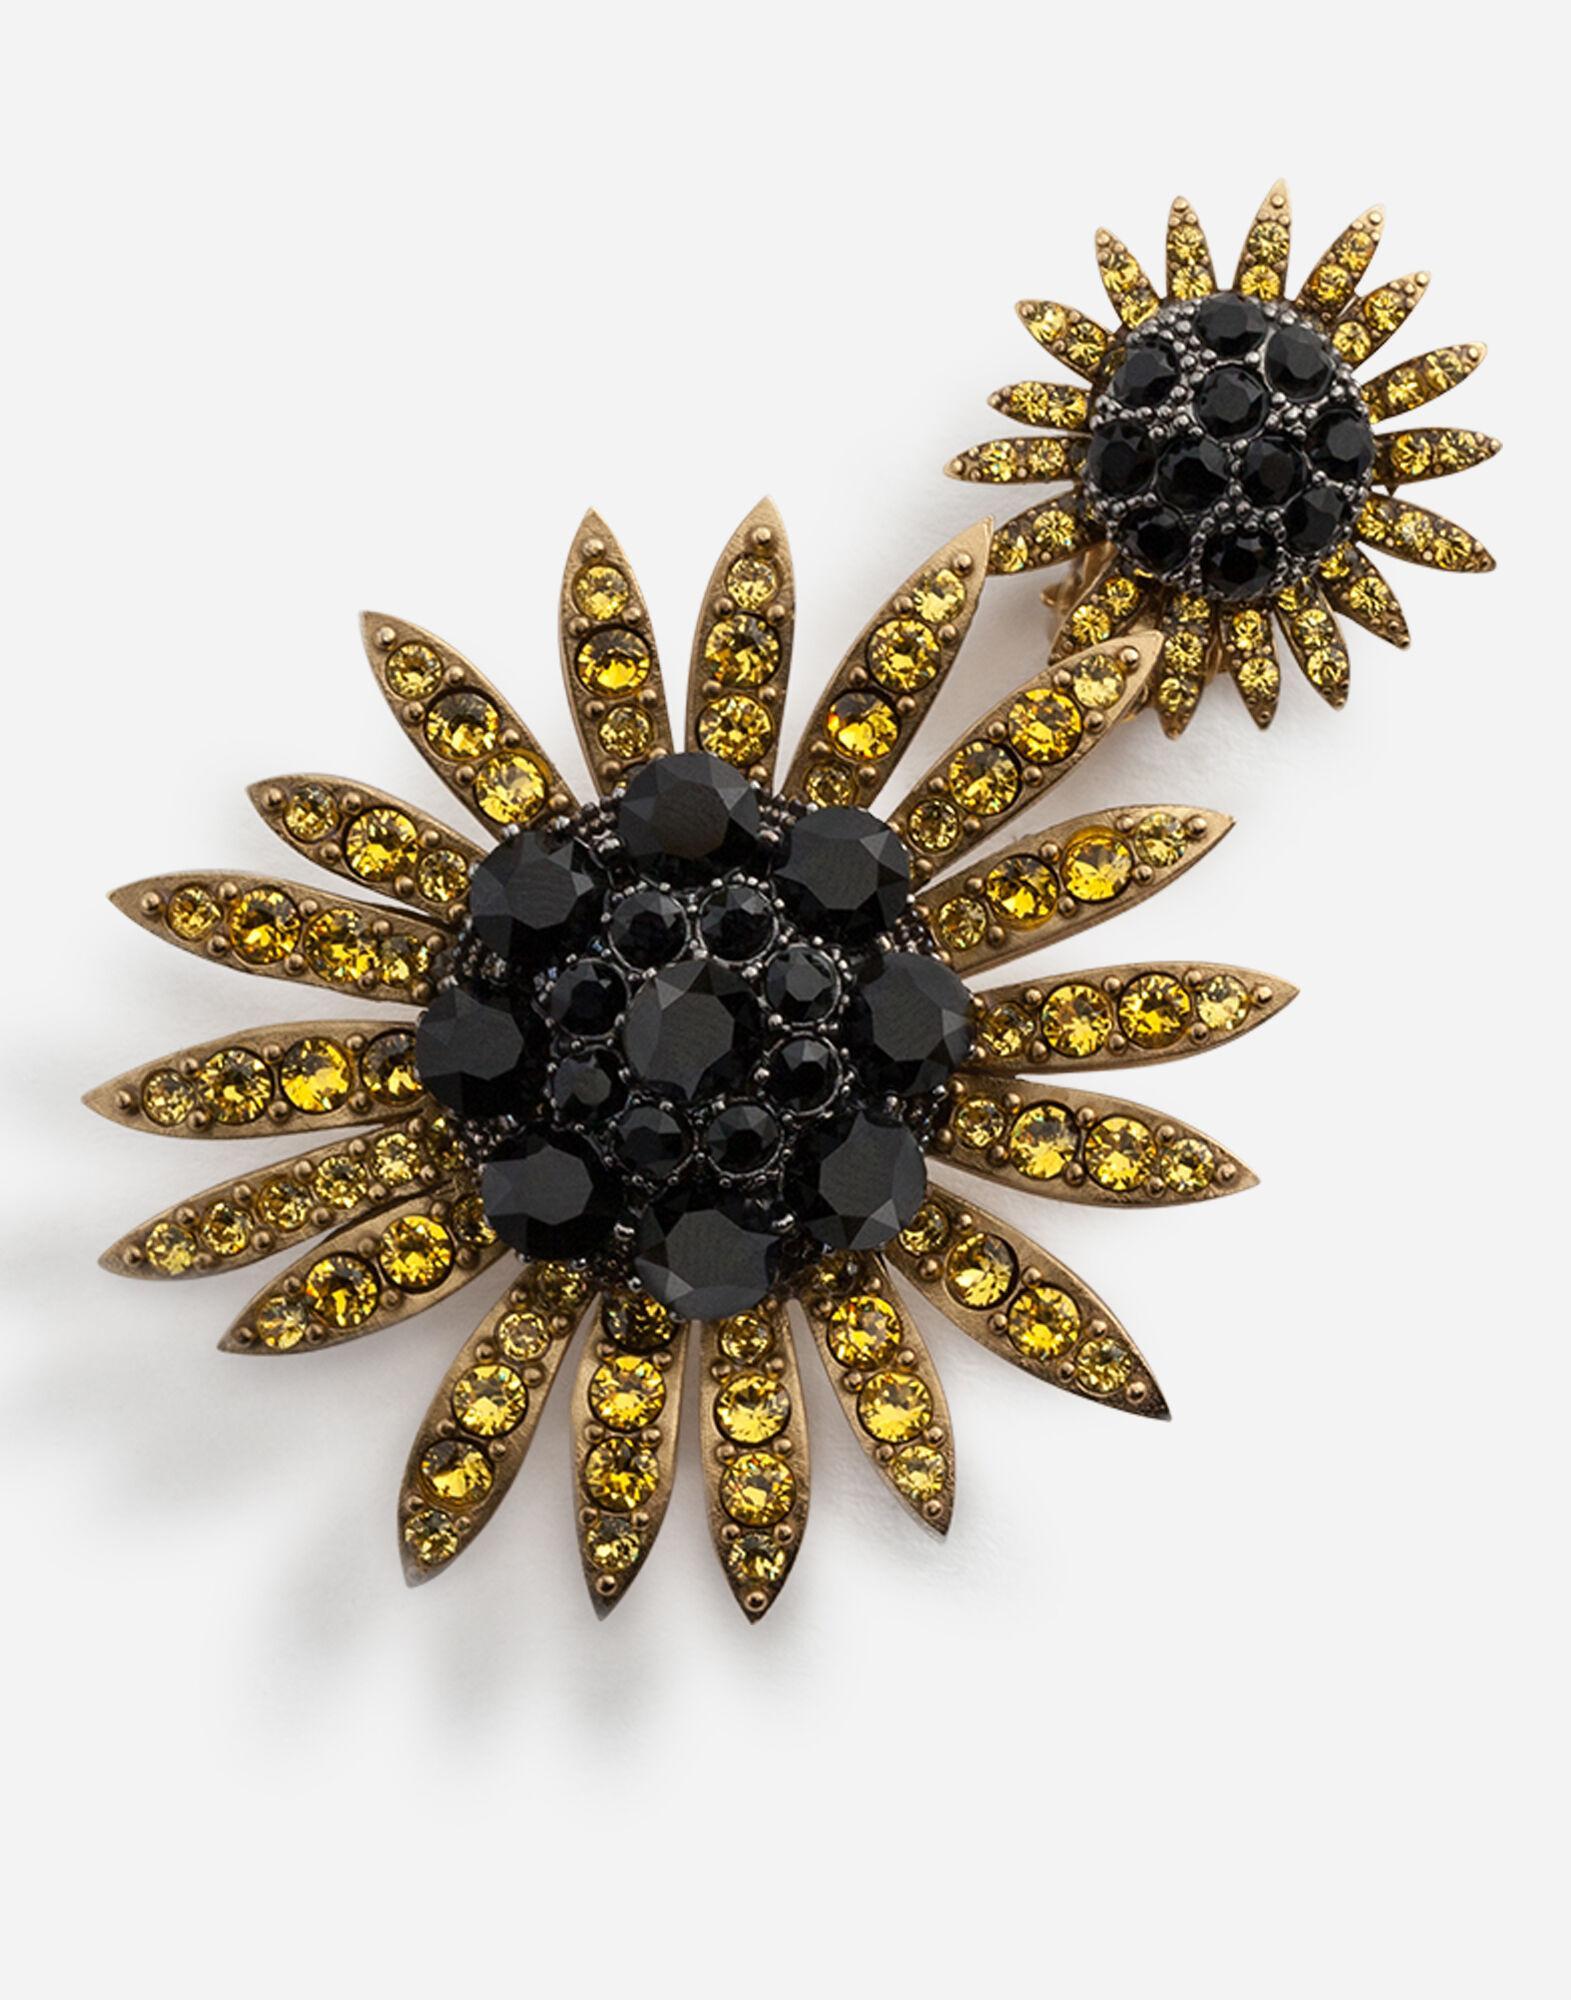 bc67943c0 Dolce & Gabbana Drop Earrings With Decorative Rhinestone Details in Metallic  - Lyst